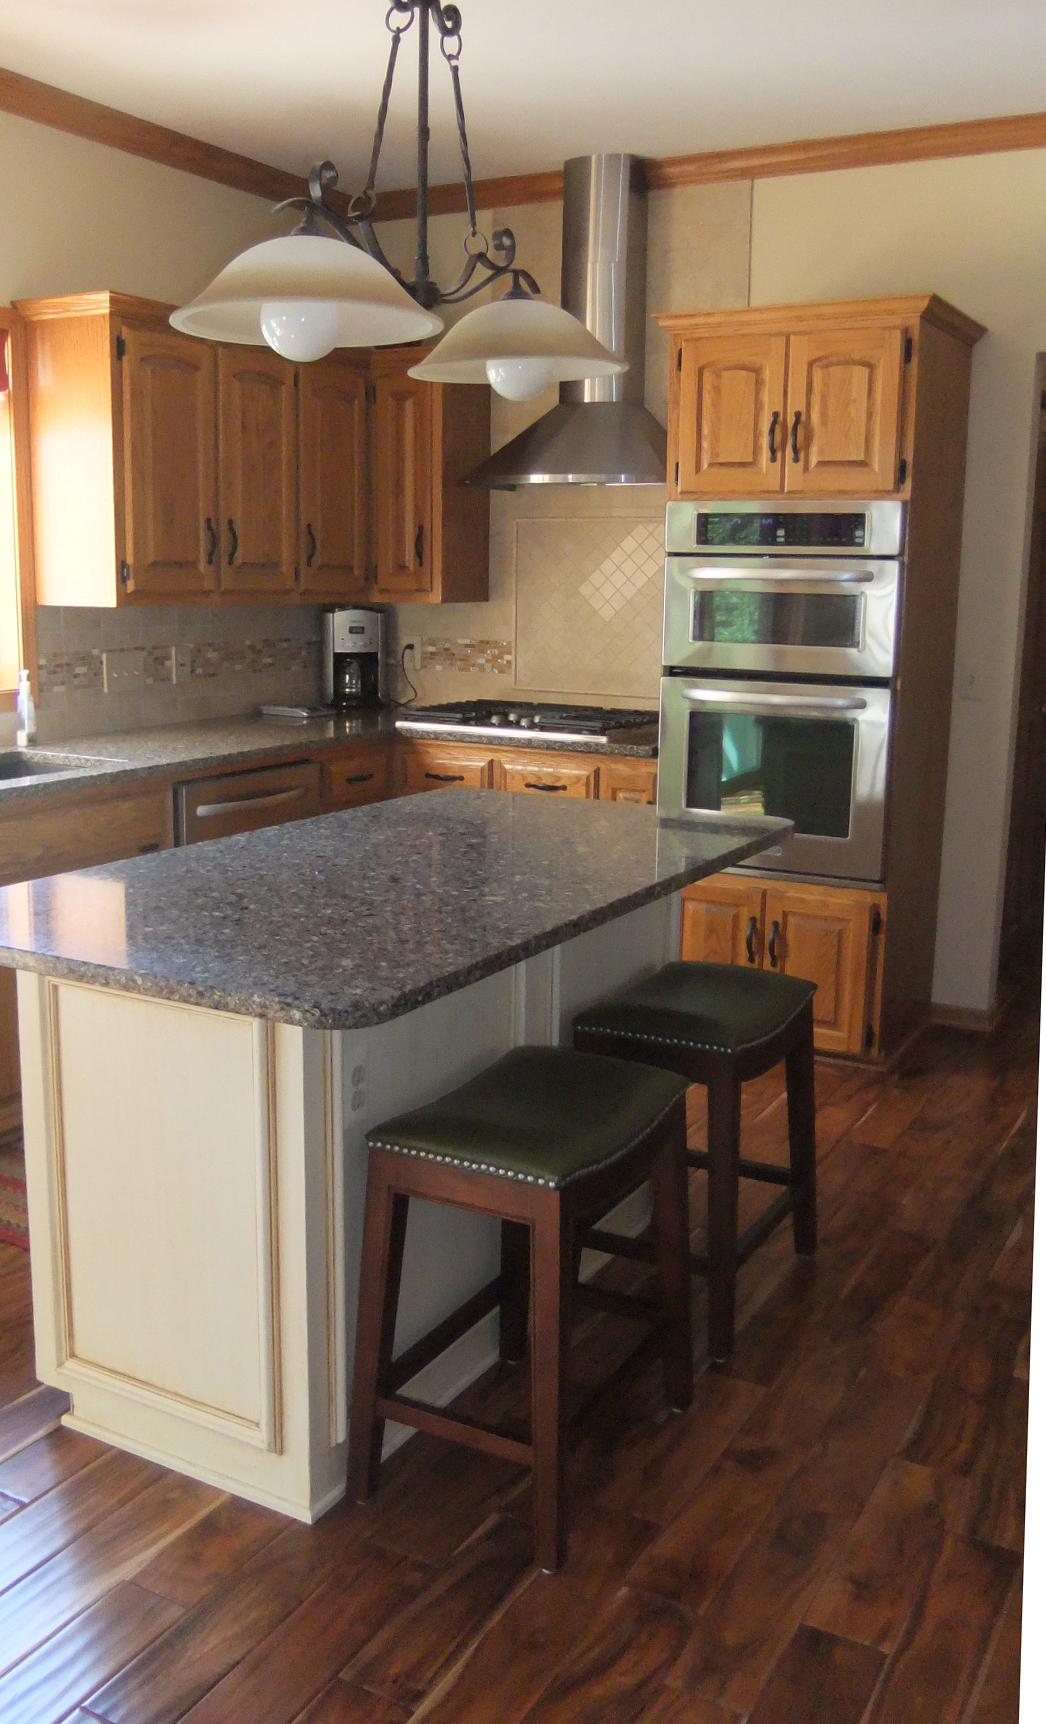 new kitchen sink cost art van tables newsroom - home life interiors